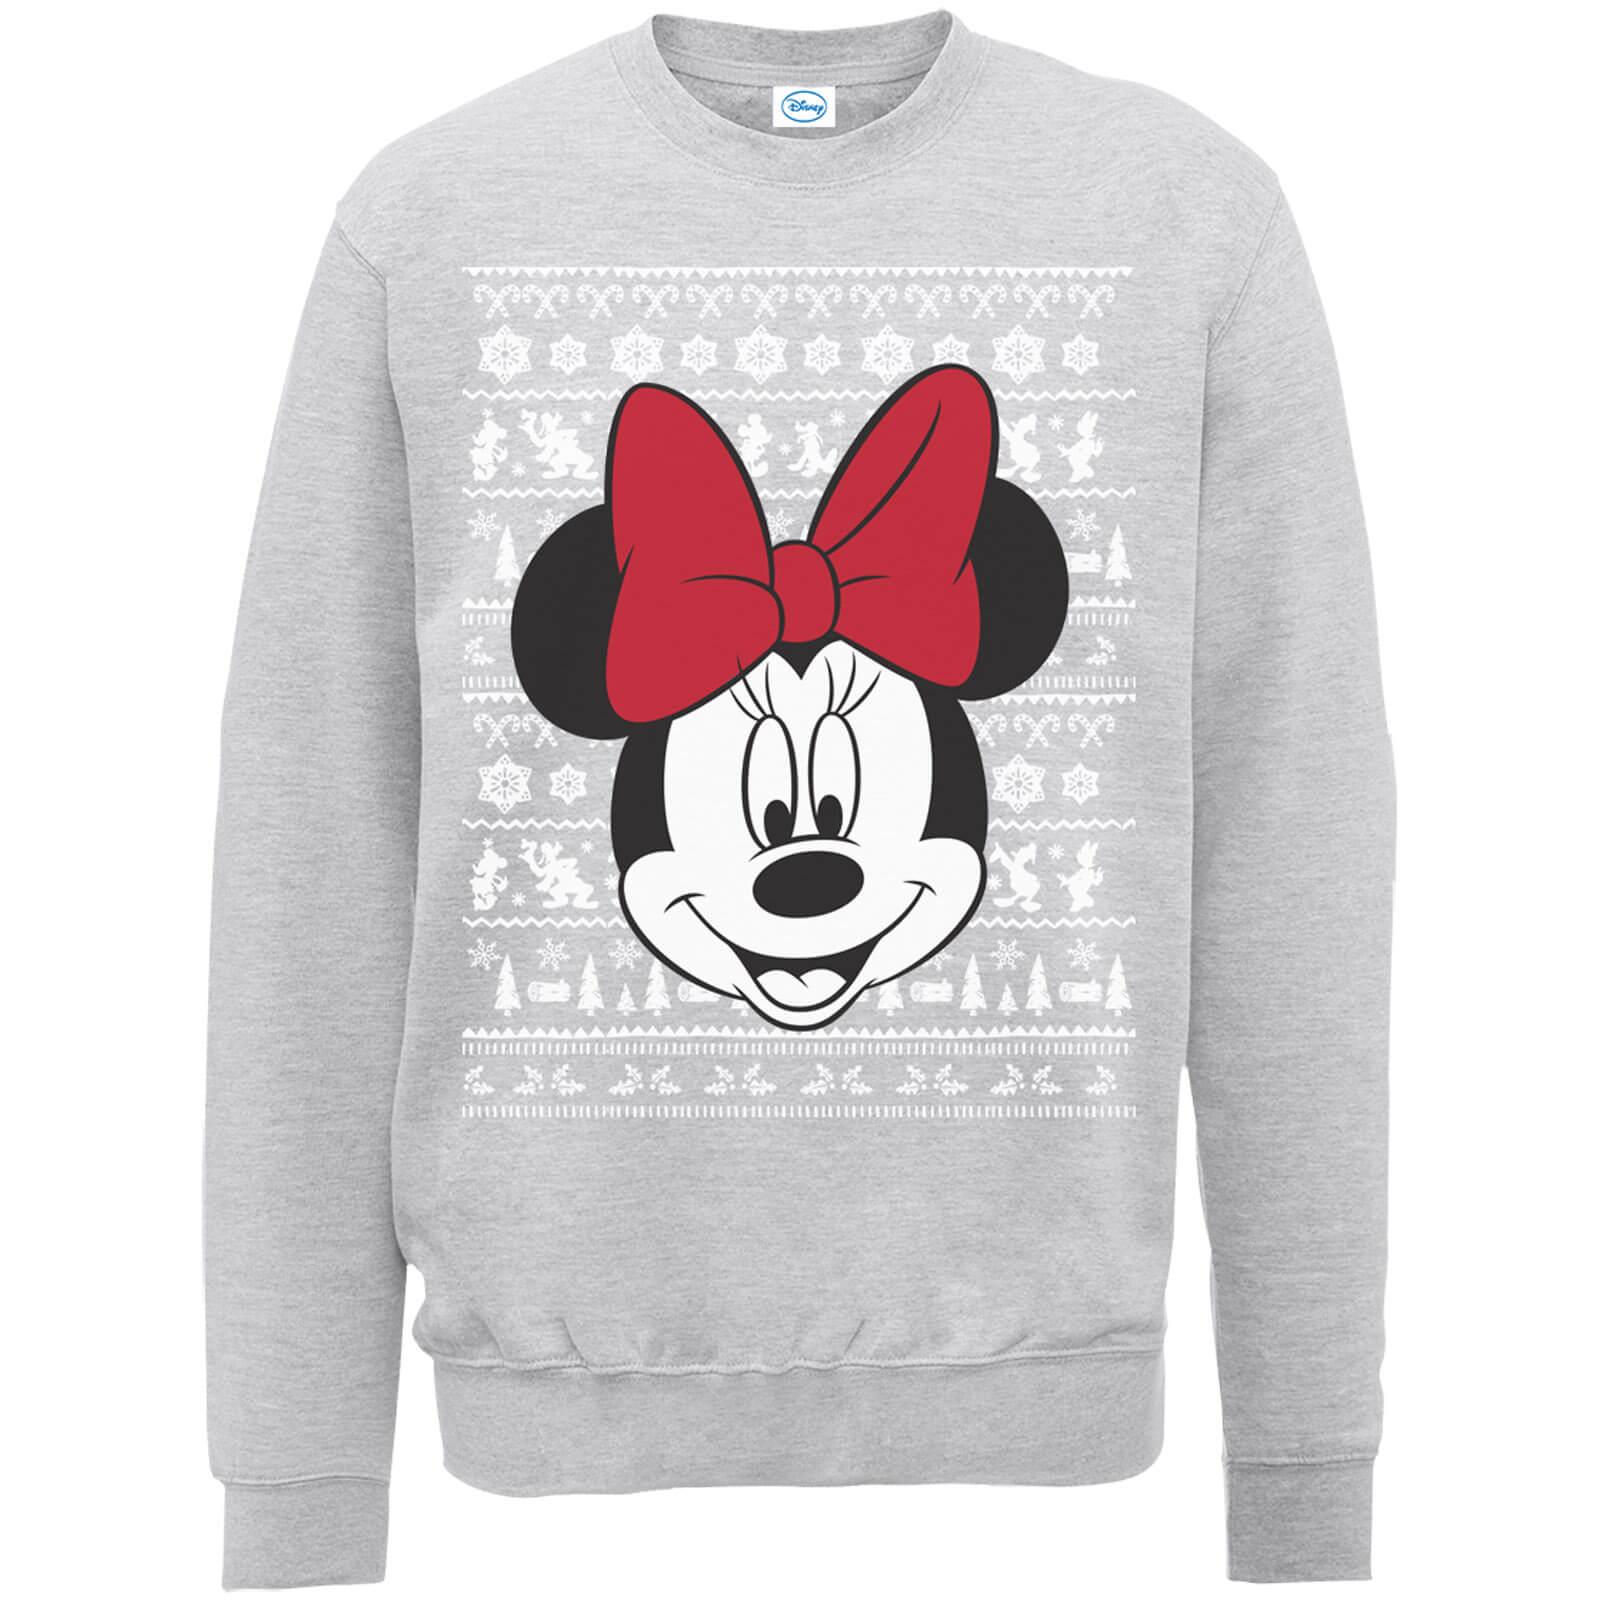 e9dbd10759 Disney Minnie Mouse Christmas Minnie Face Grey Christmas Sweatshirt